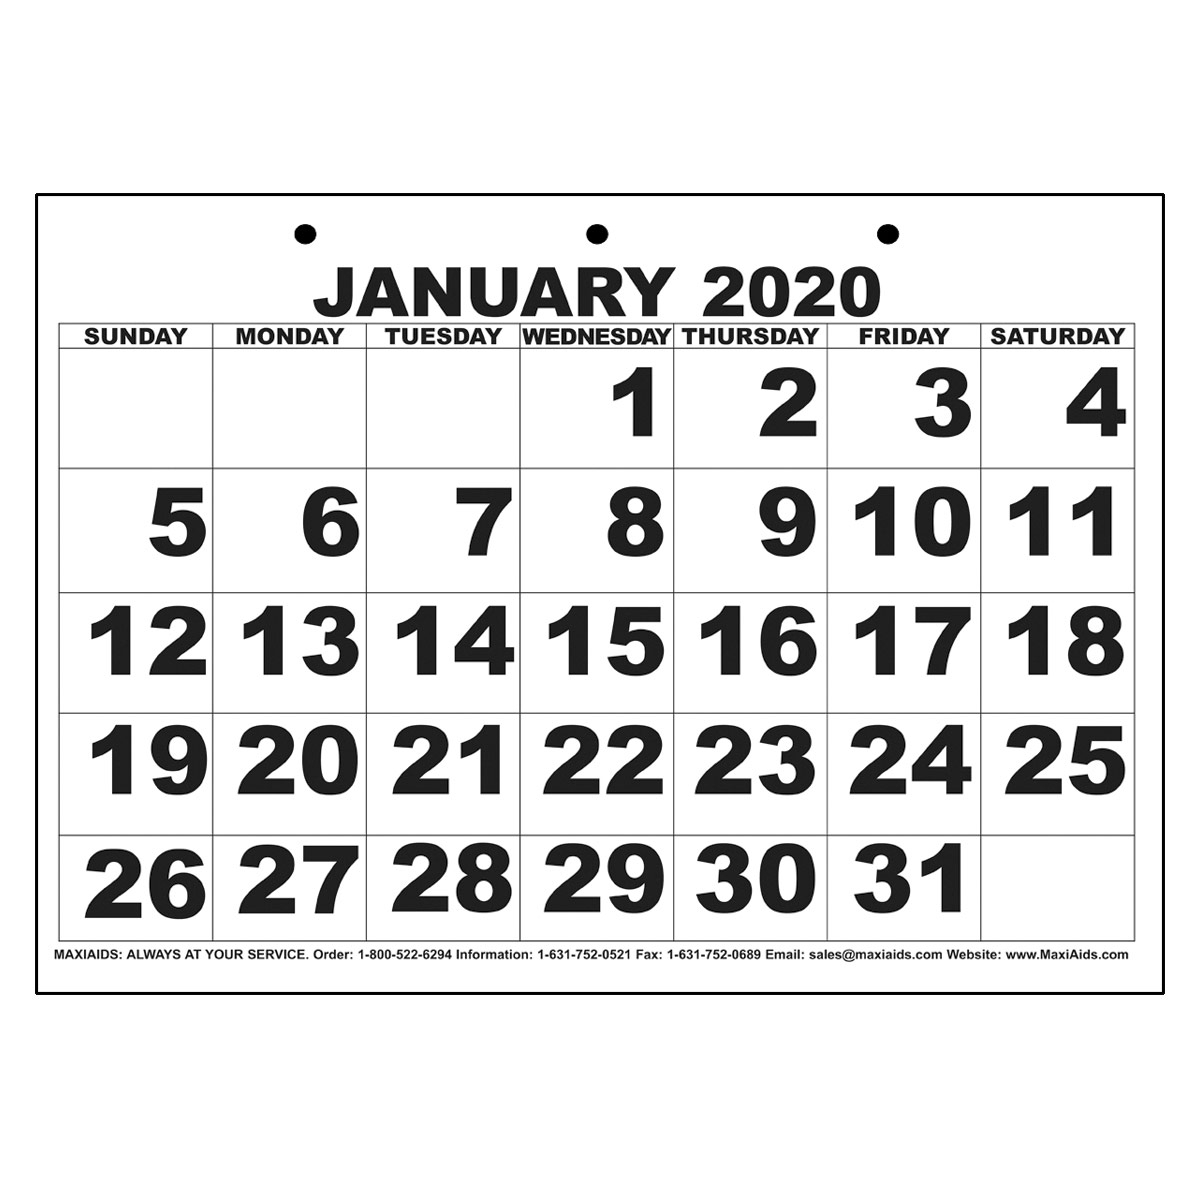 Low Vision Print Calendar - 2020 throughout Large Numbers Free Printable Calendar 2020